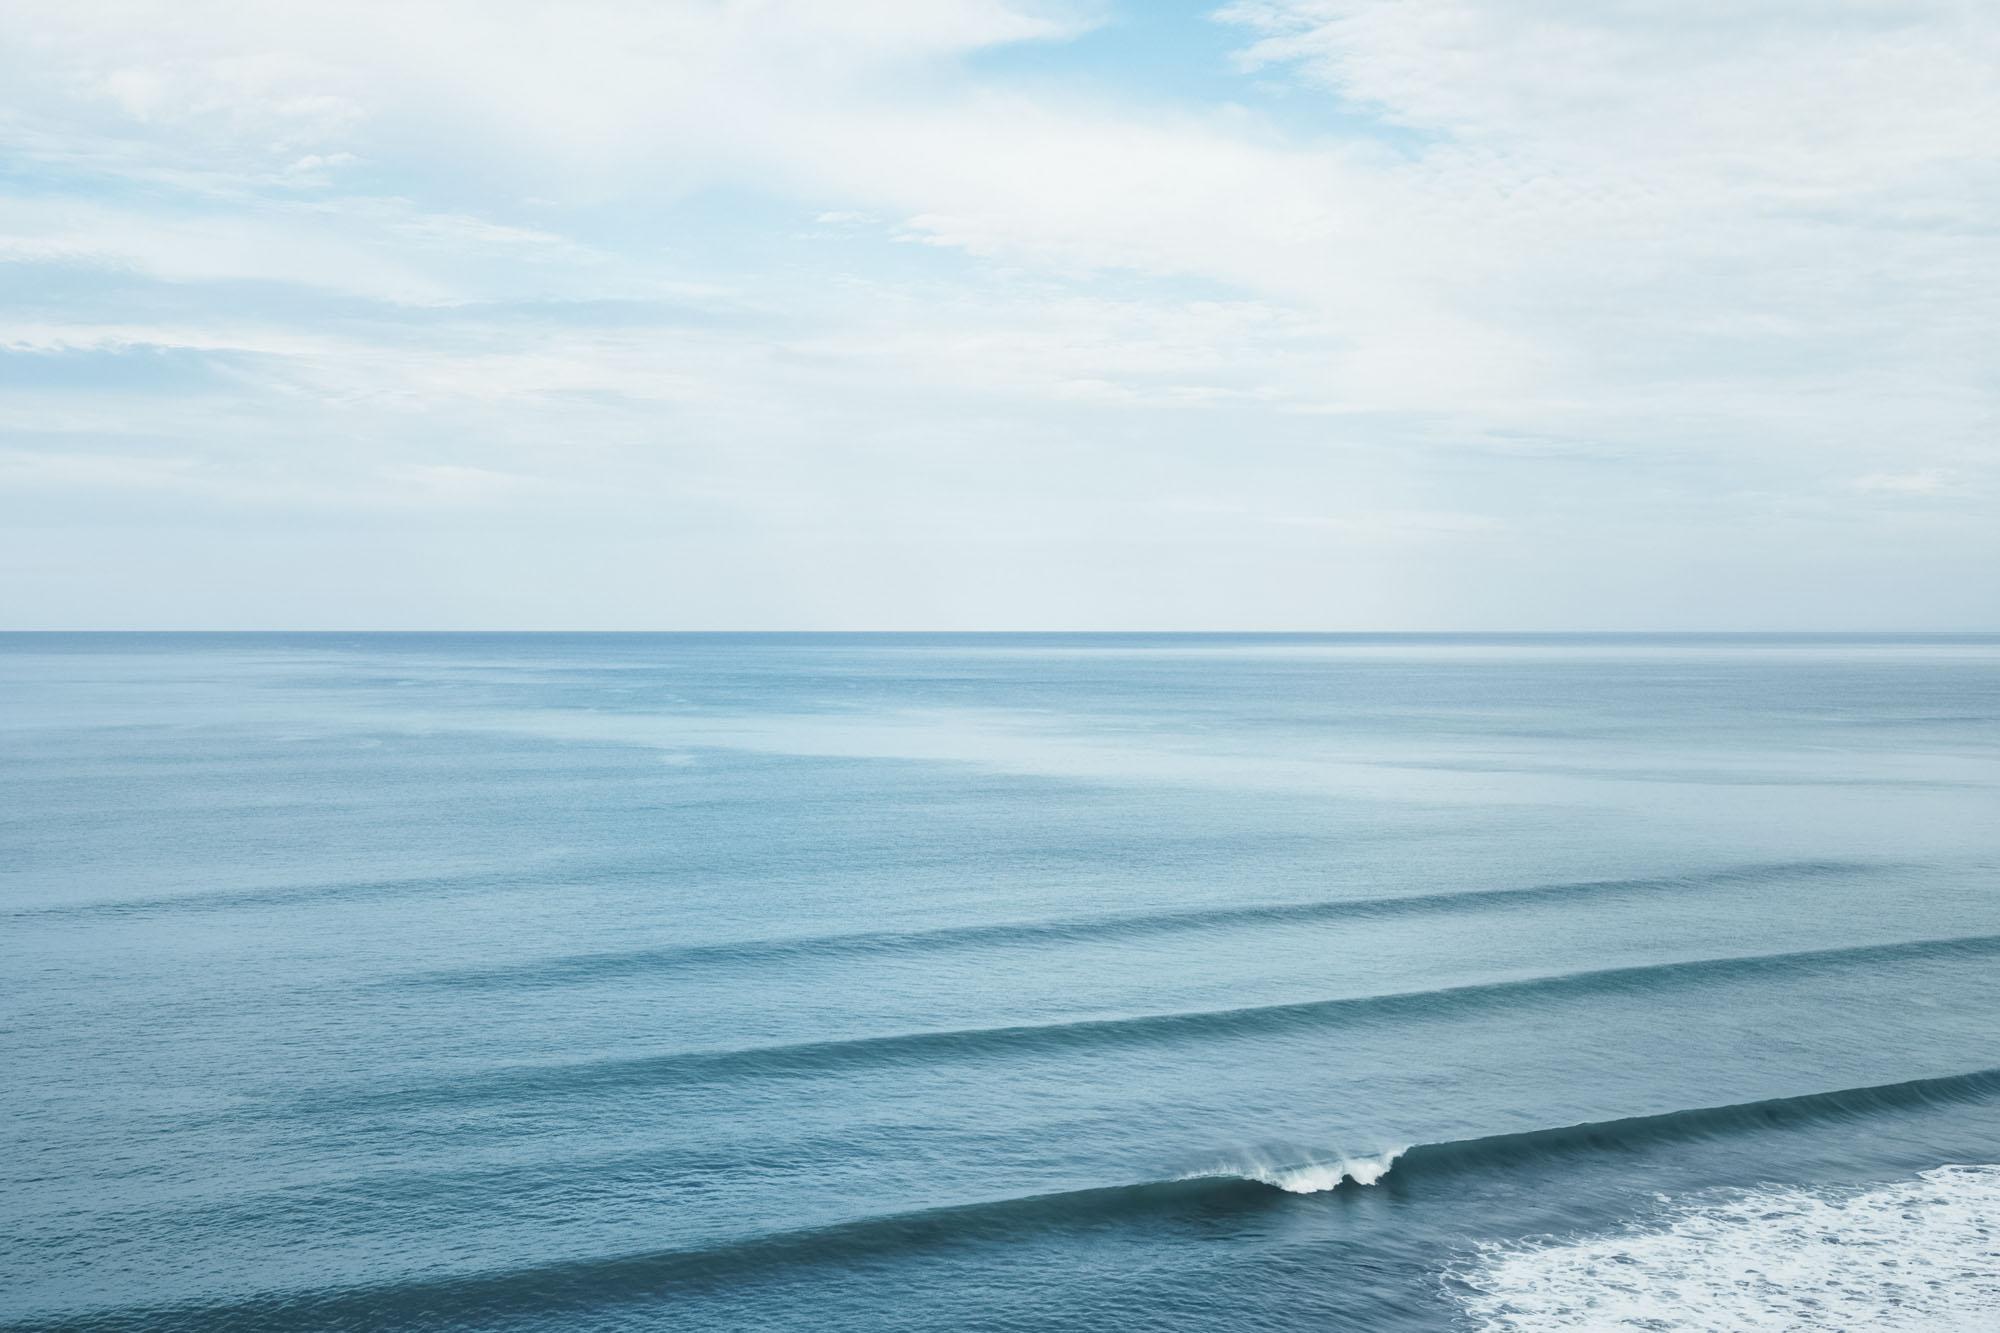 calm waves breaking calmly